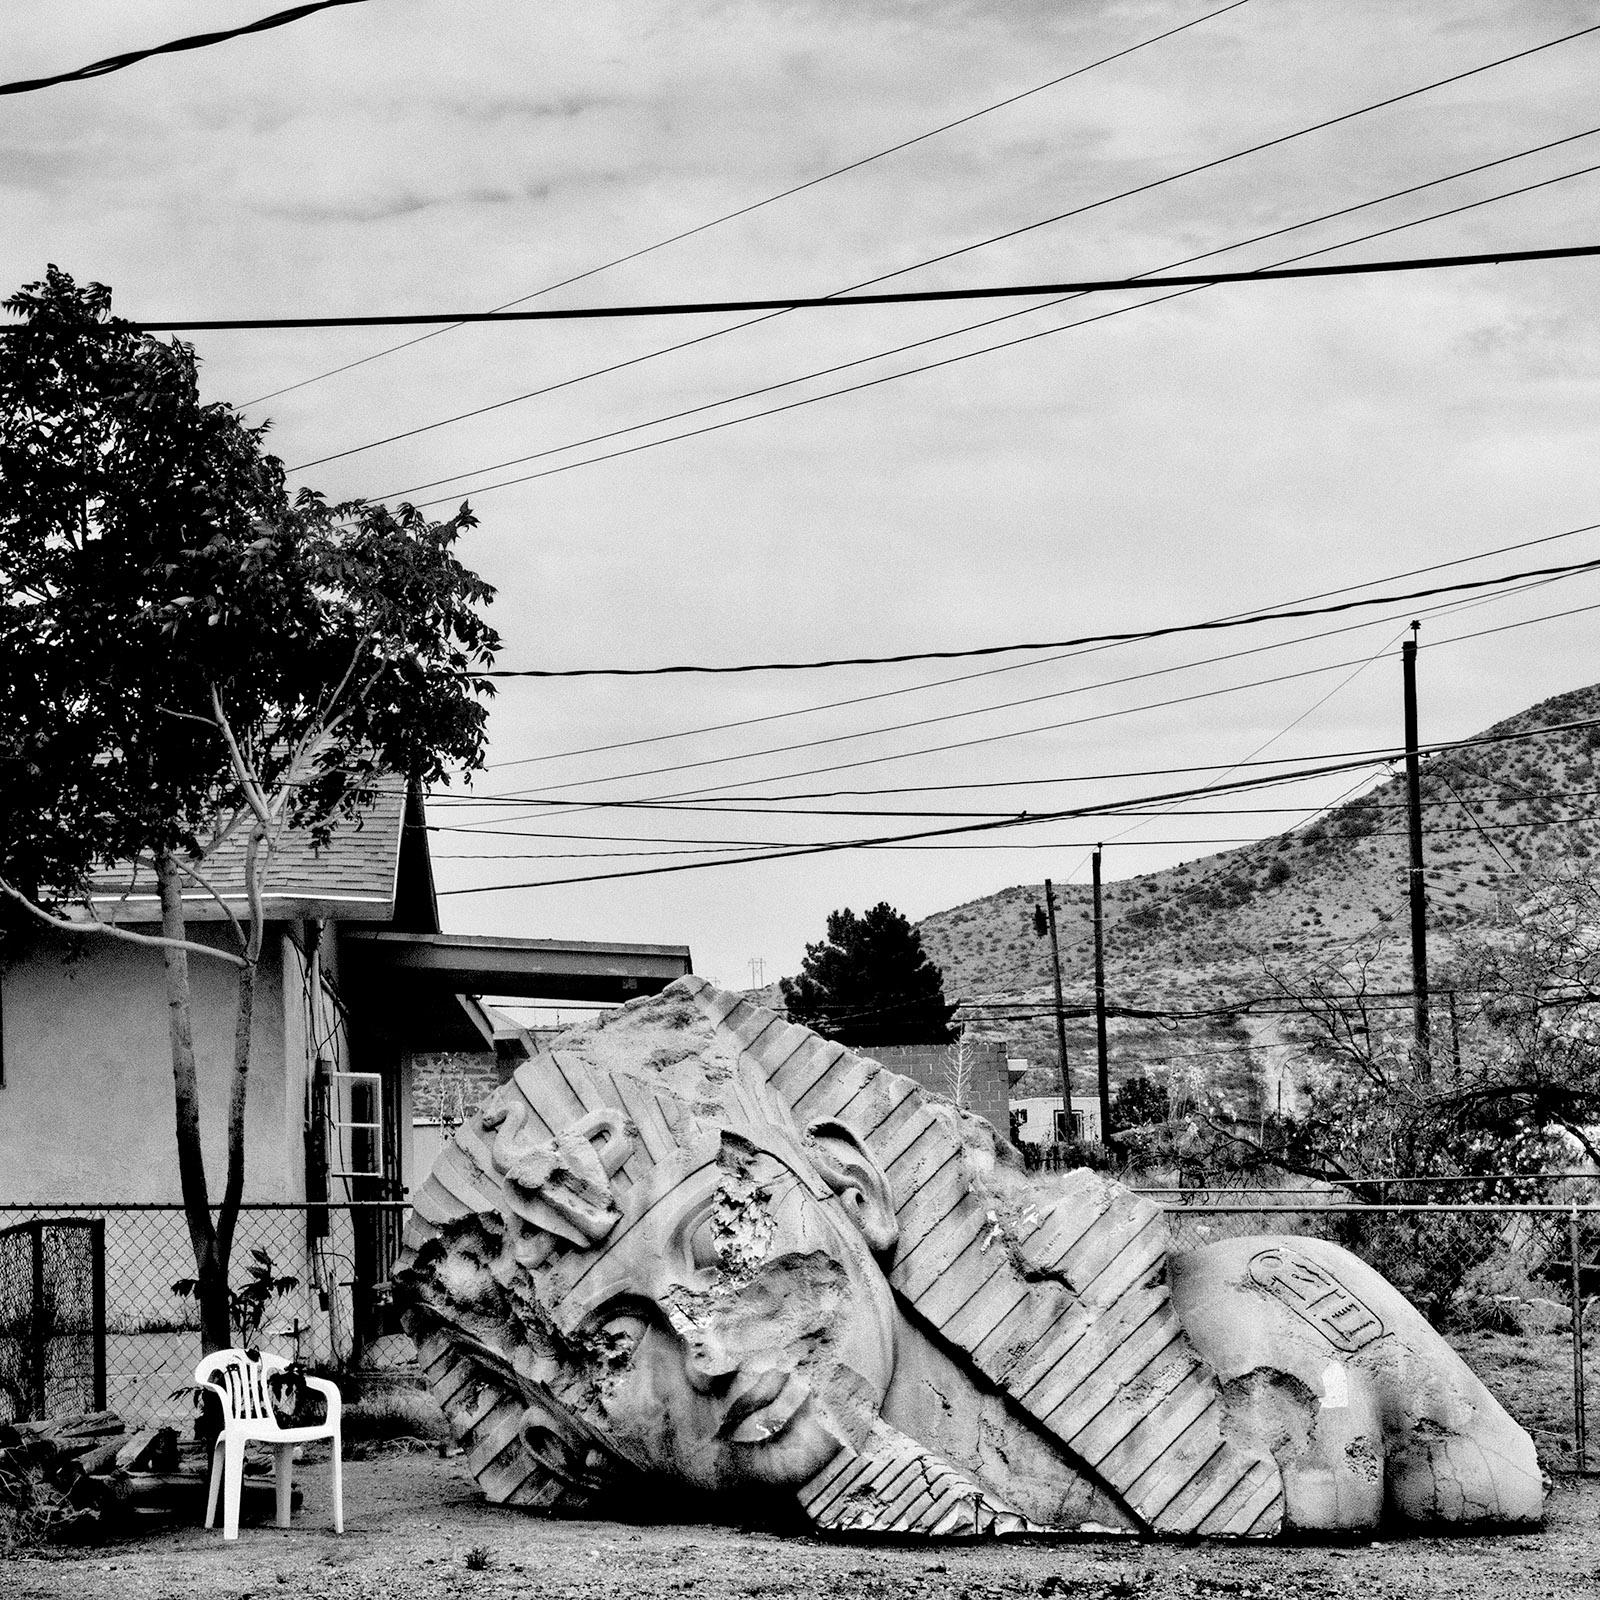 Doña Ana County, New Mexico, 2017